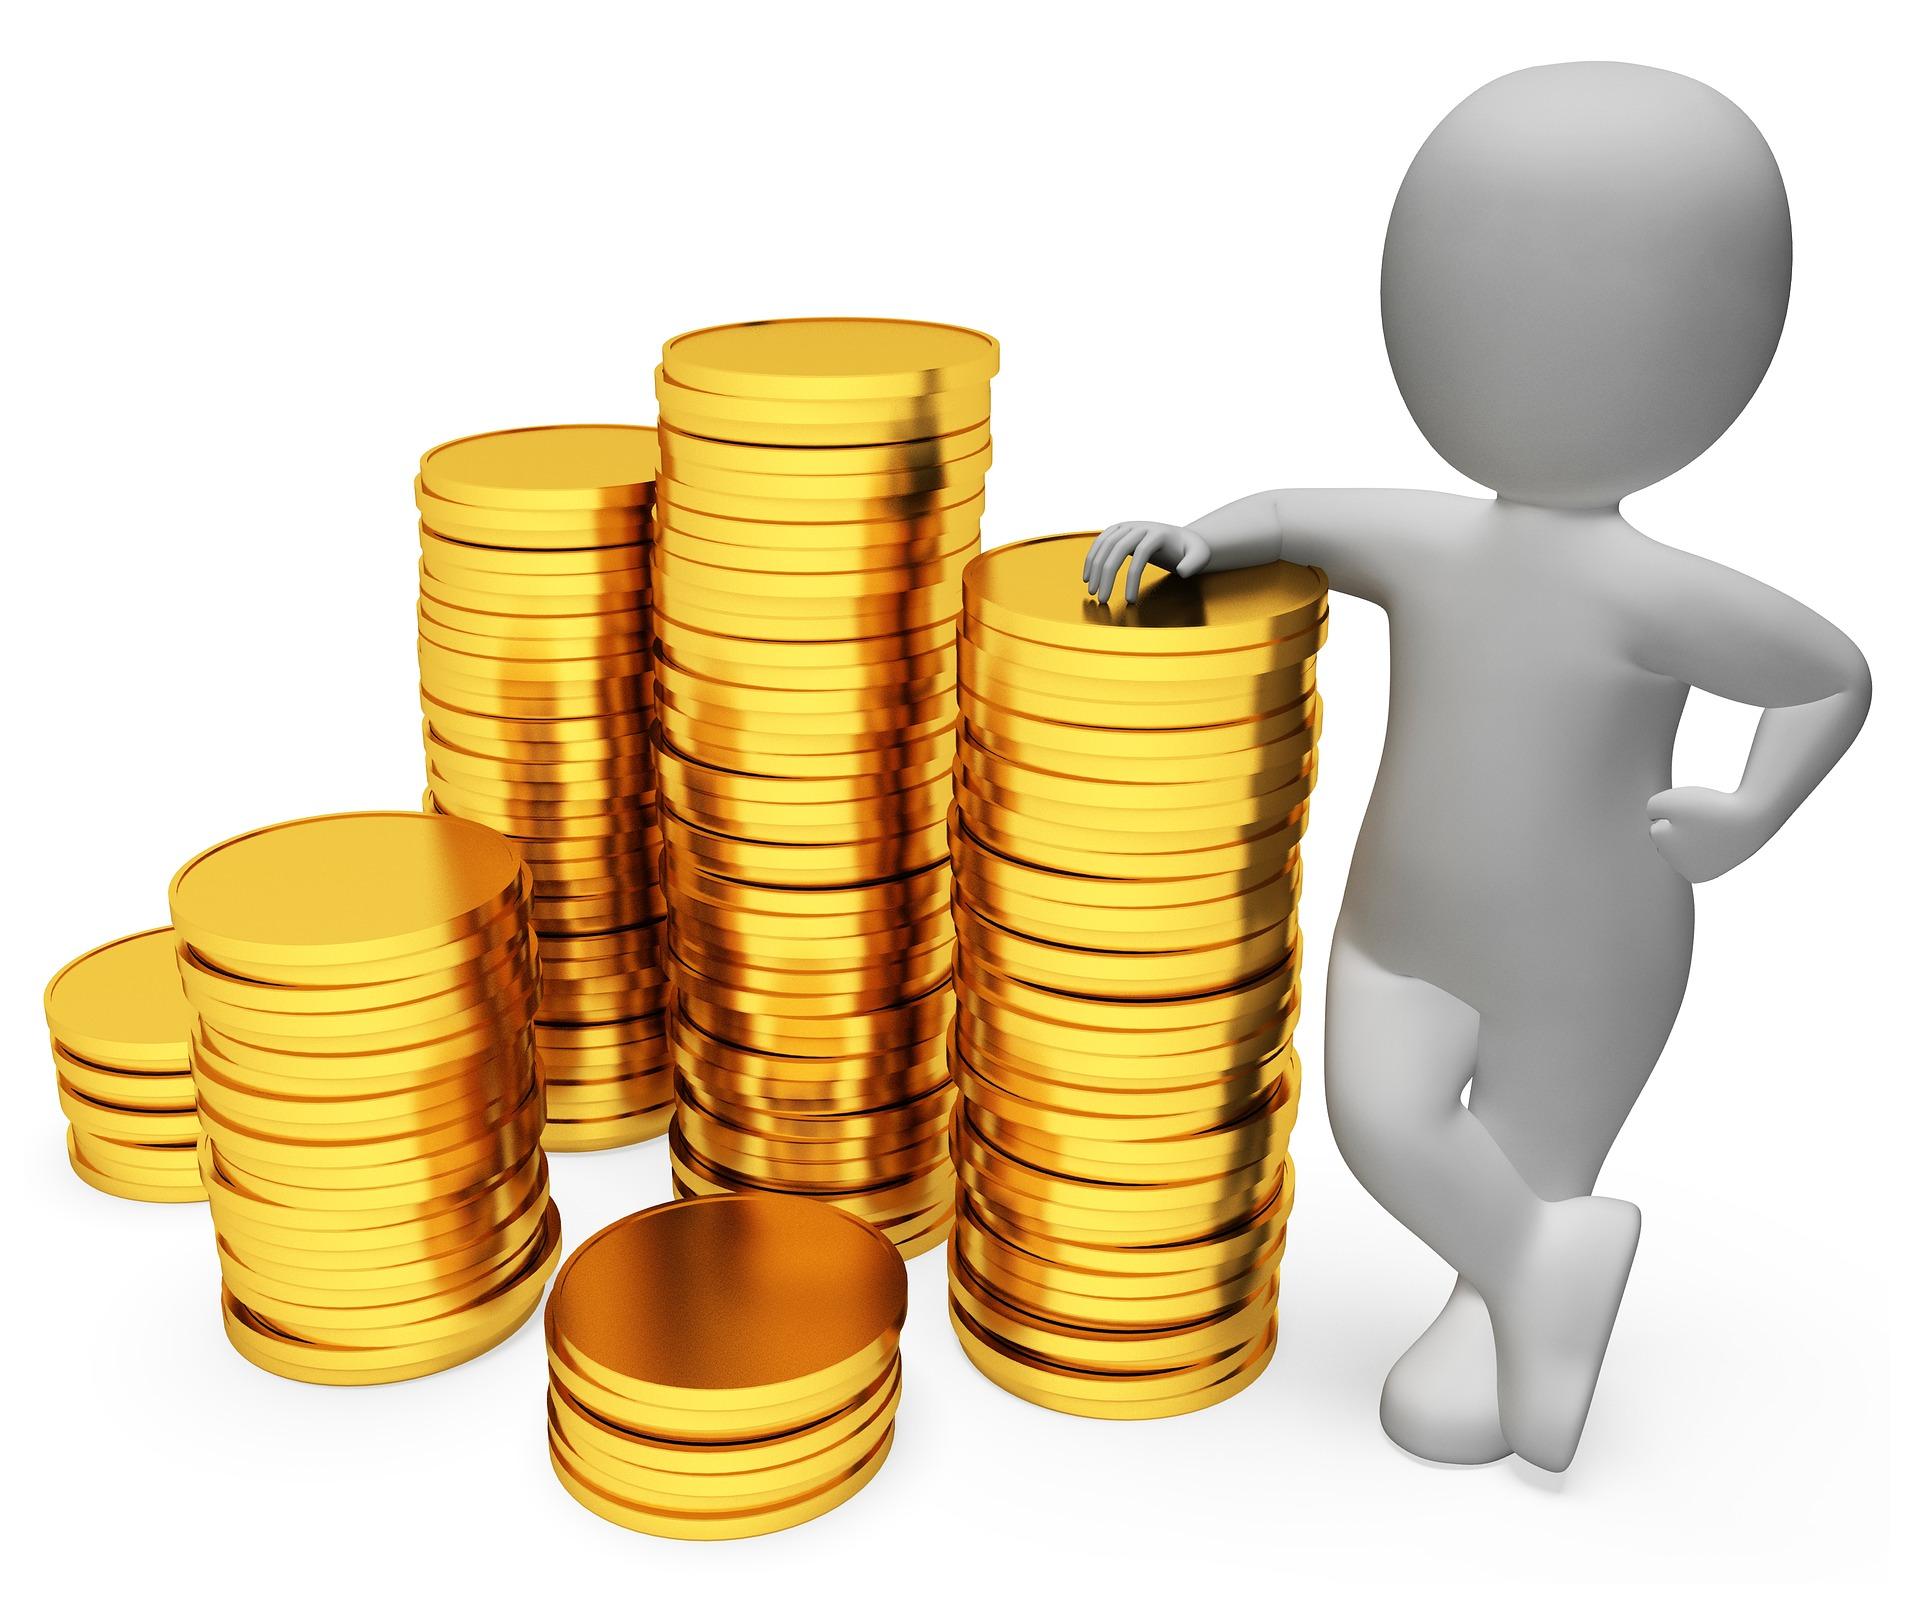 iFree8資産バランスの評価や評判は?実質コストはどれくらい?